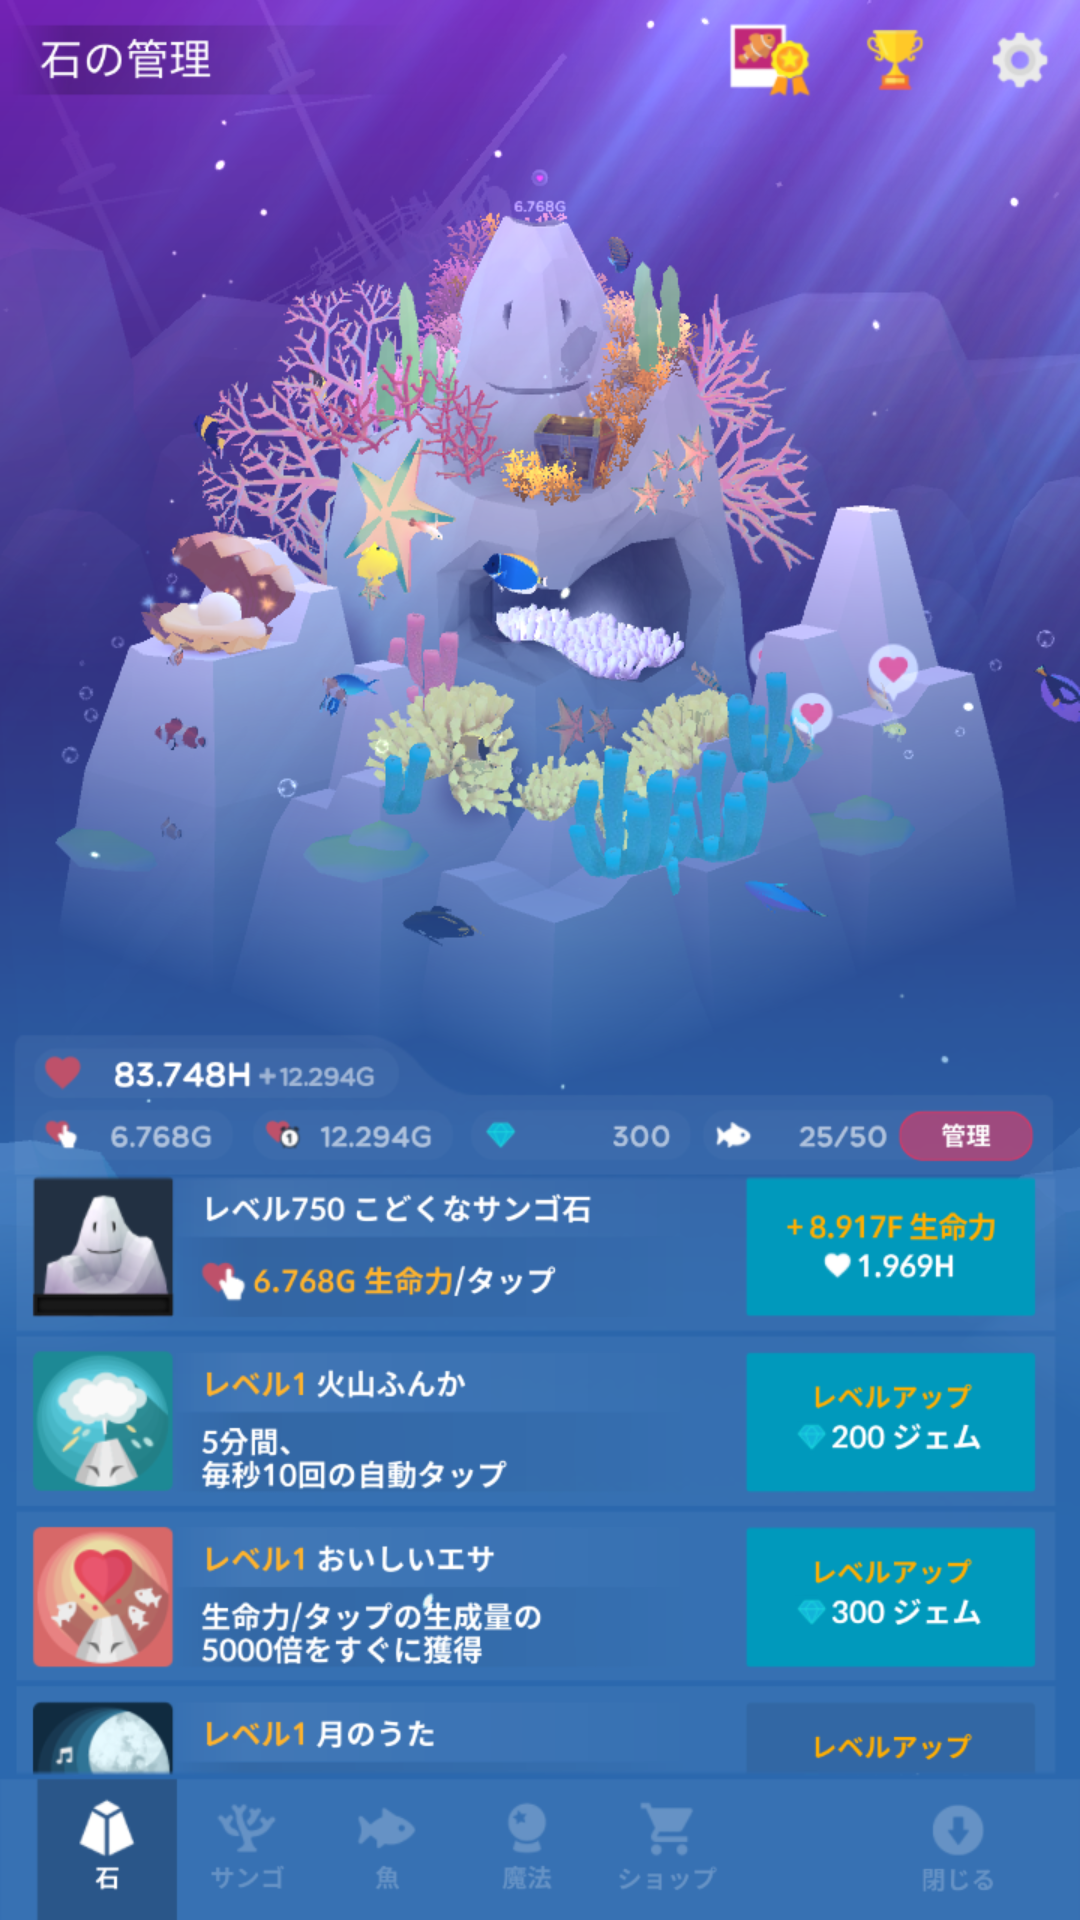 androidアプリ アビスリウム(Abyssrium)攻略スクリーンショット3